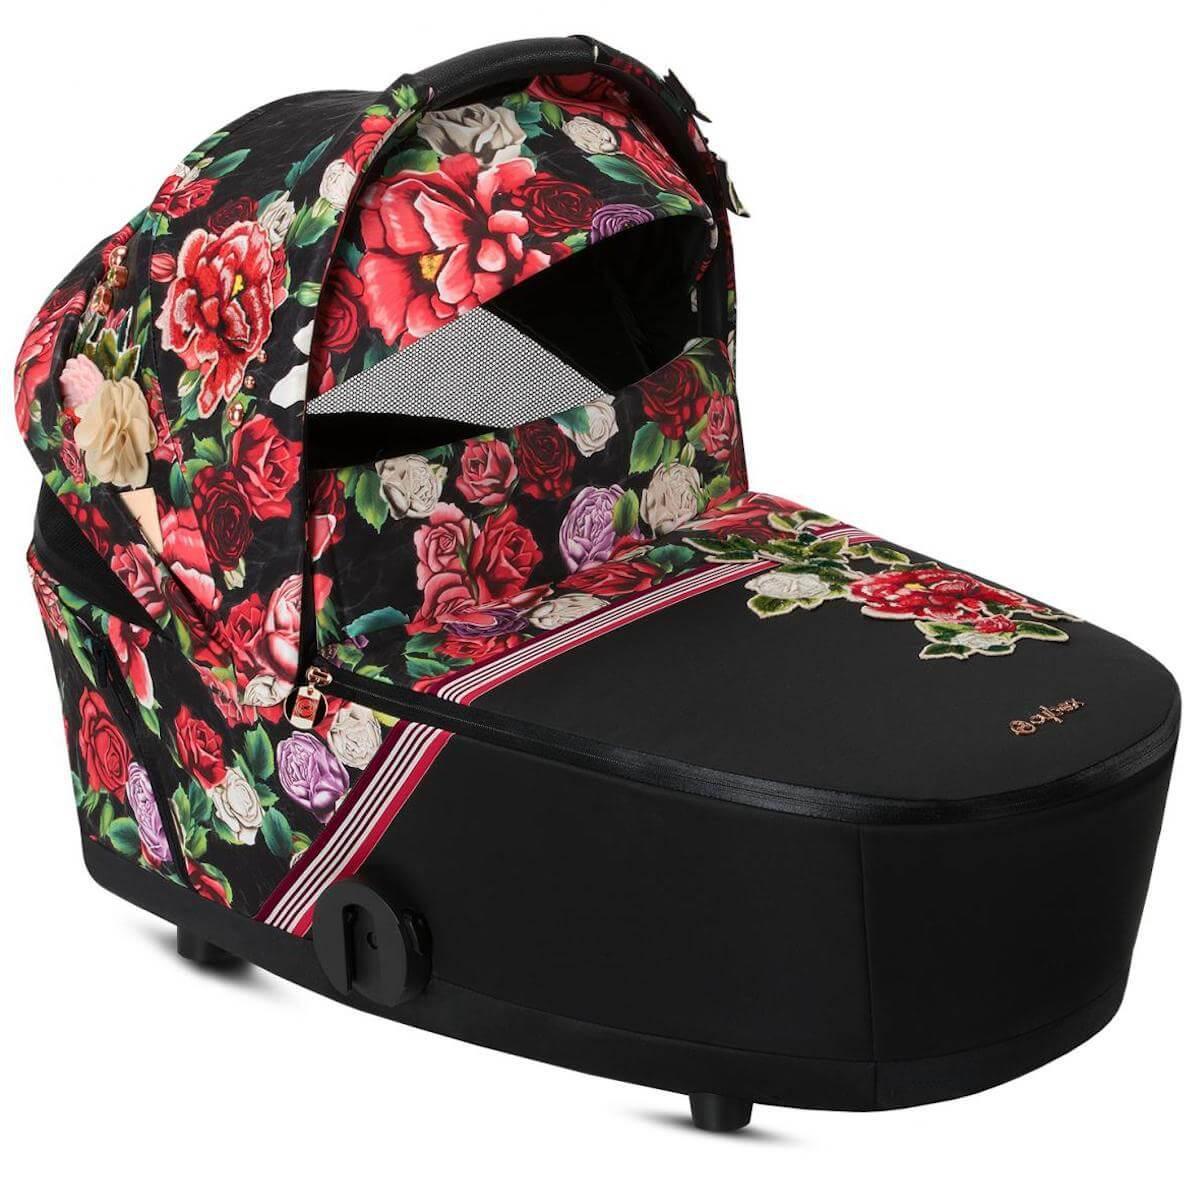 Nacelle de luxe MIOS Cybex Spring Blossom Dark-black